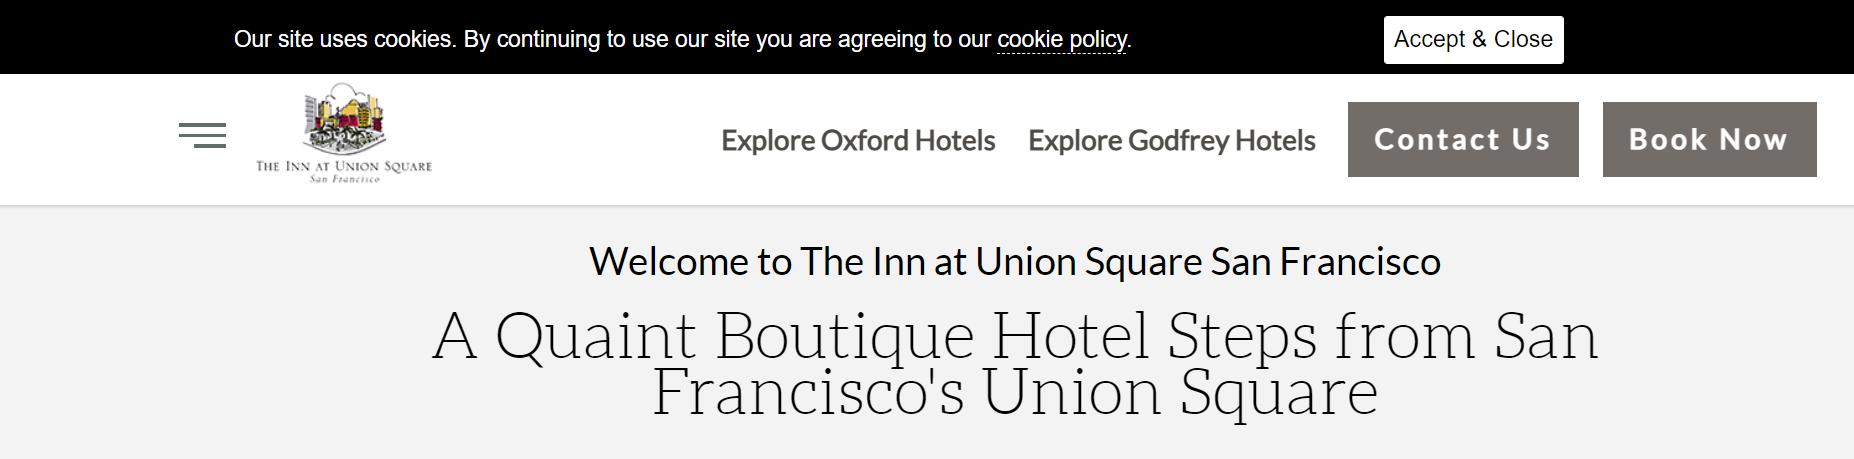 The Inn at Union Square San Francisco